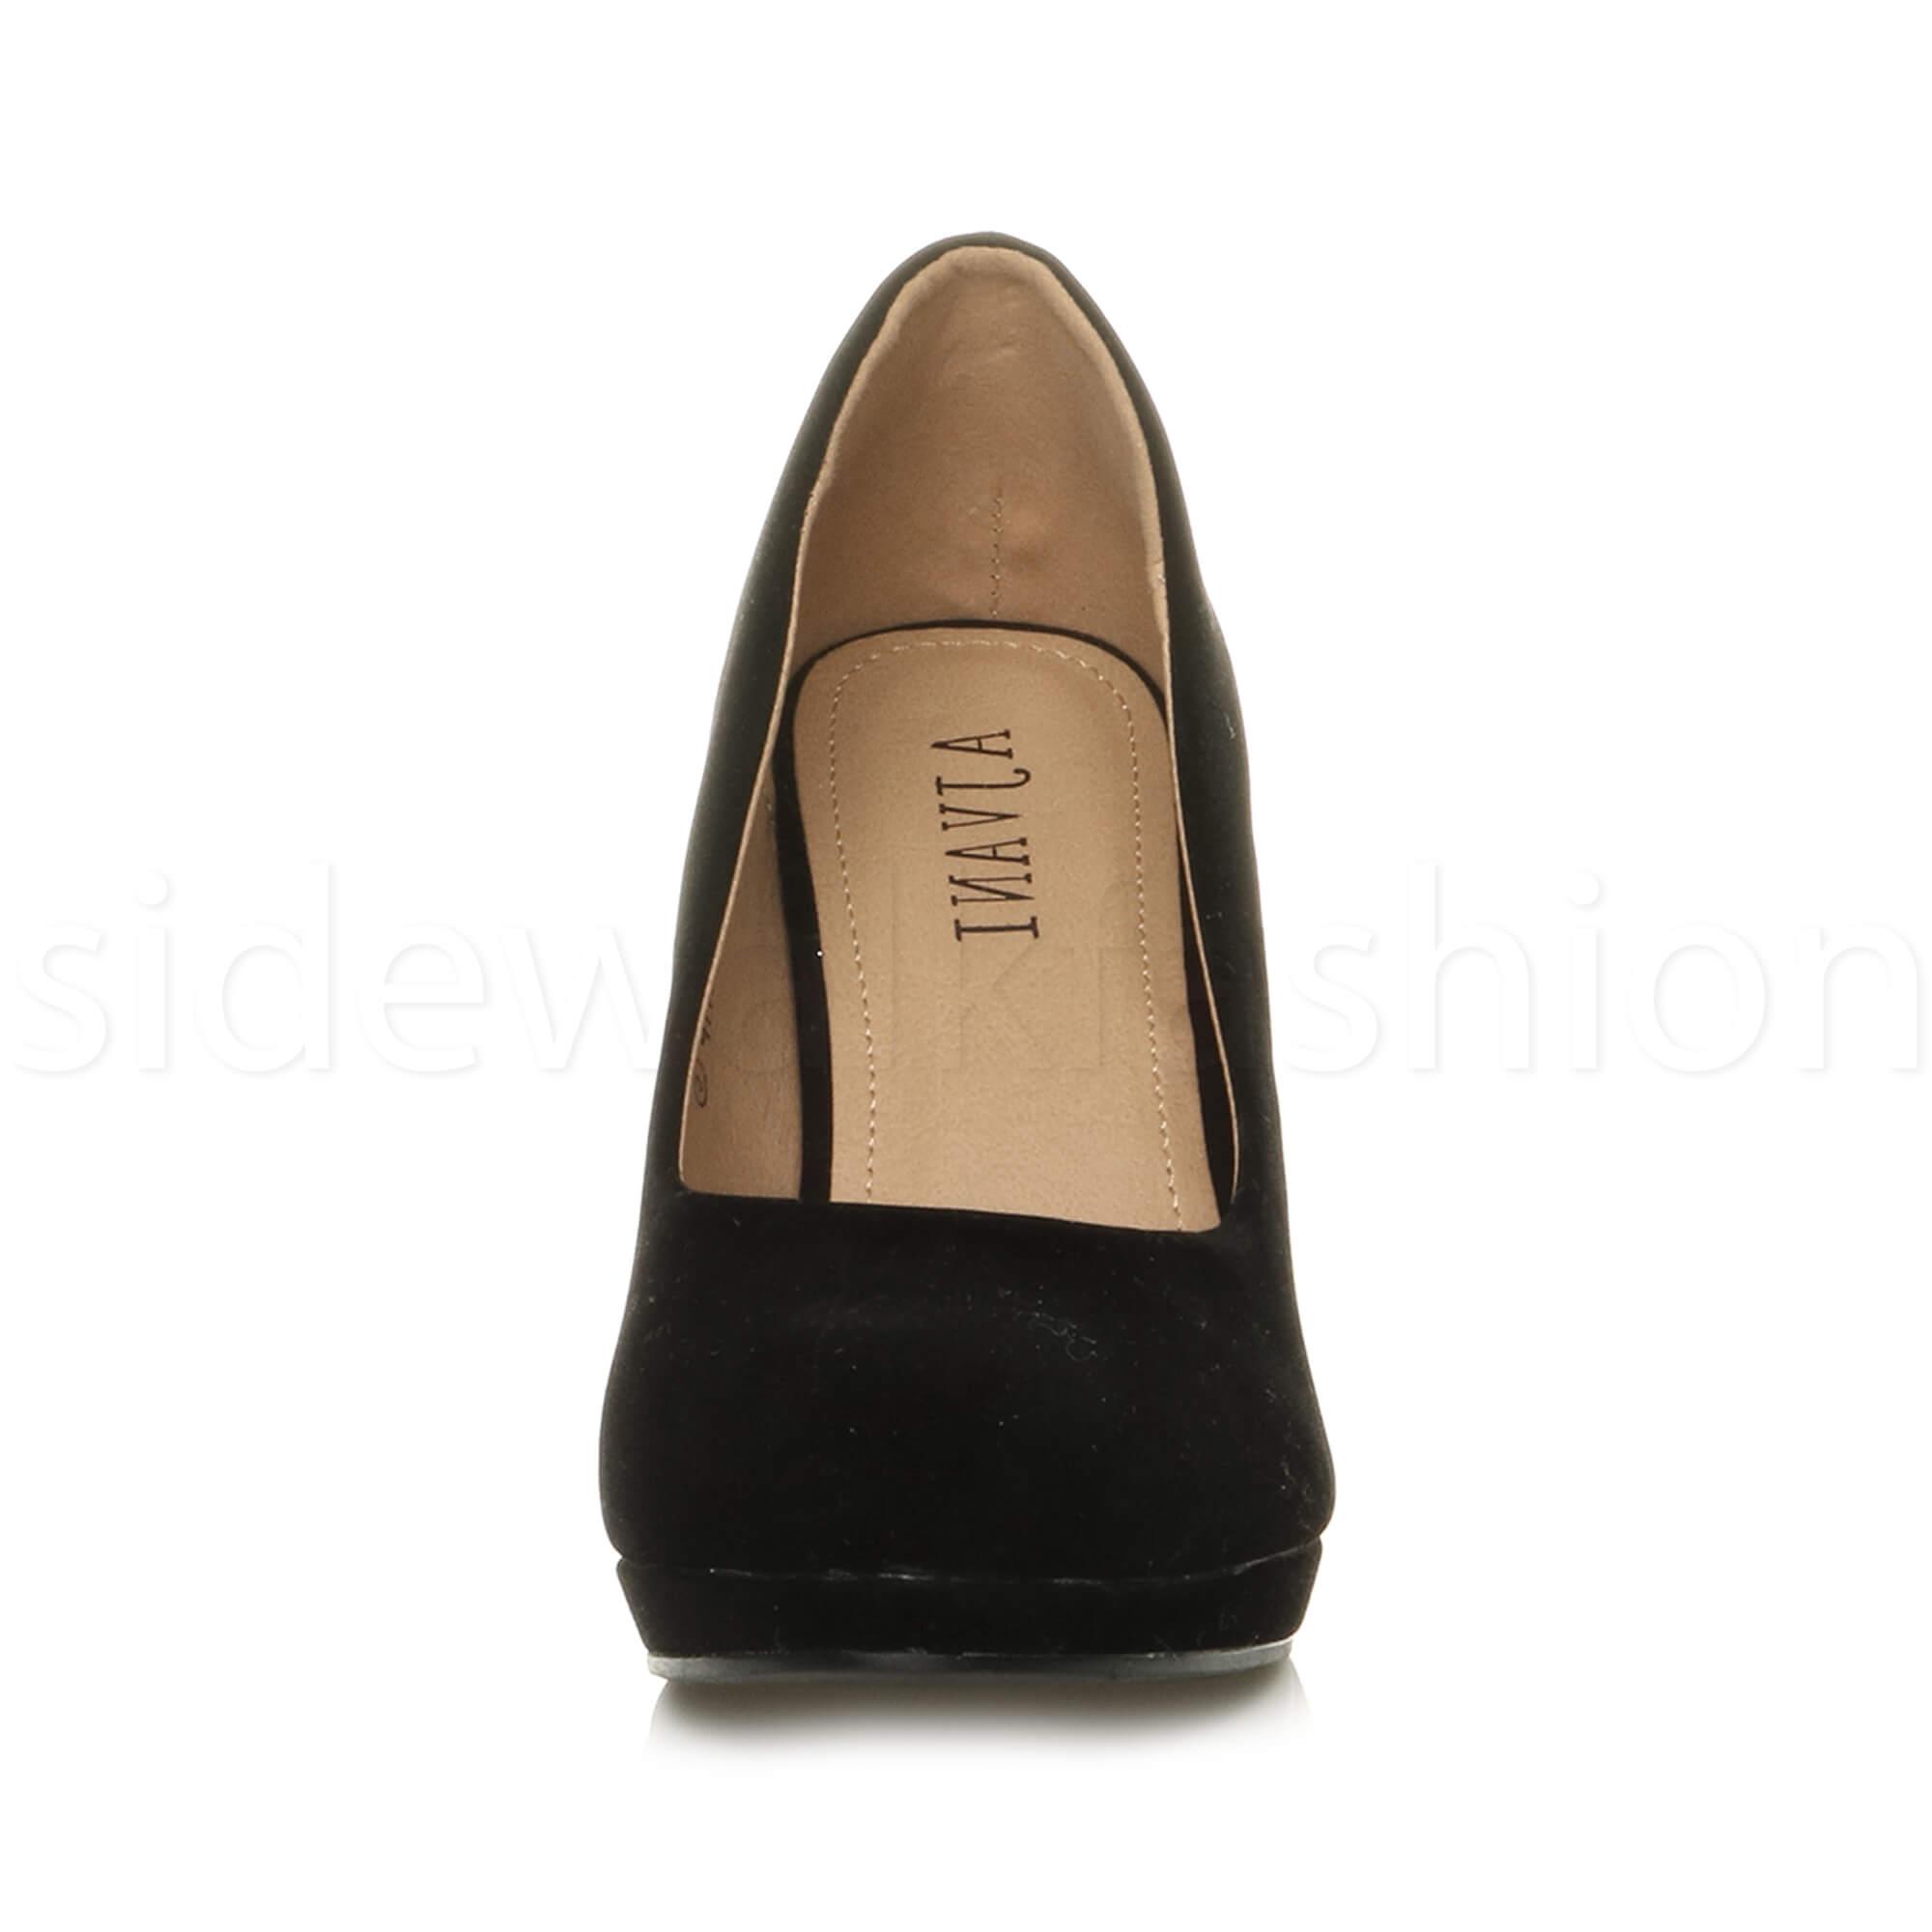 Womens-ladies-high-mid-heel-platform-wedding-evening-bridesmaid-court-shoes-size thumbnail 34